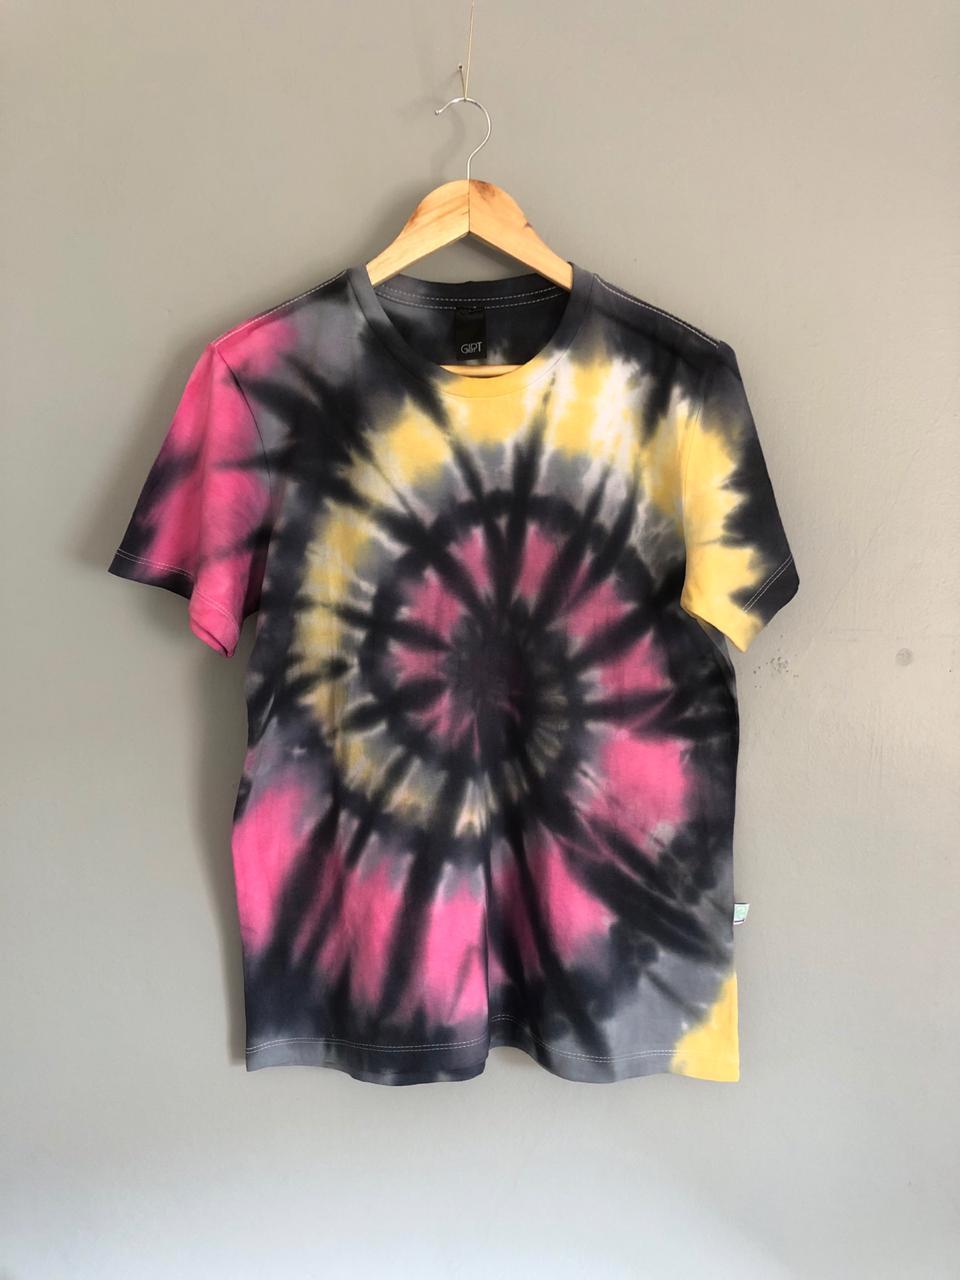 Camiseta Tie Dye - VÓRTEX